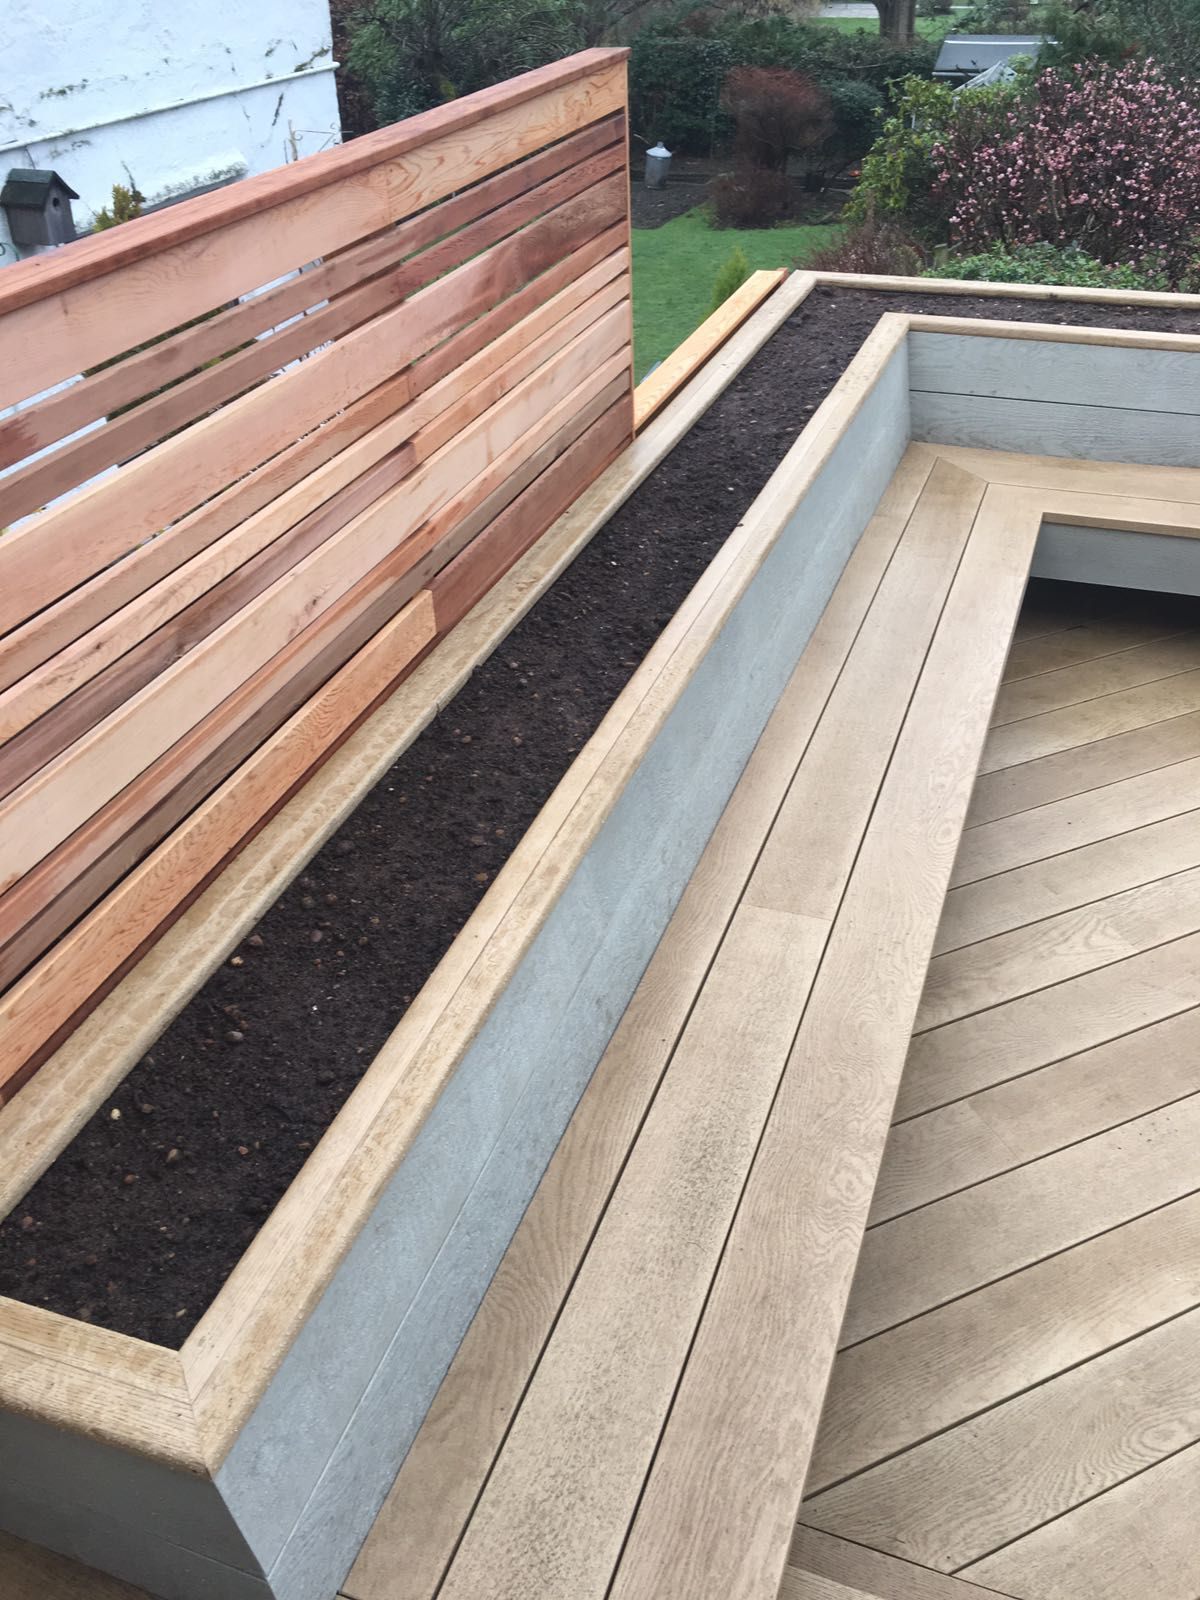 Composite Decking Composite Decking Building A Deck Outdoor Gardens Design